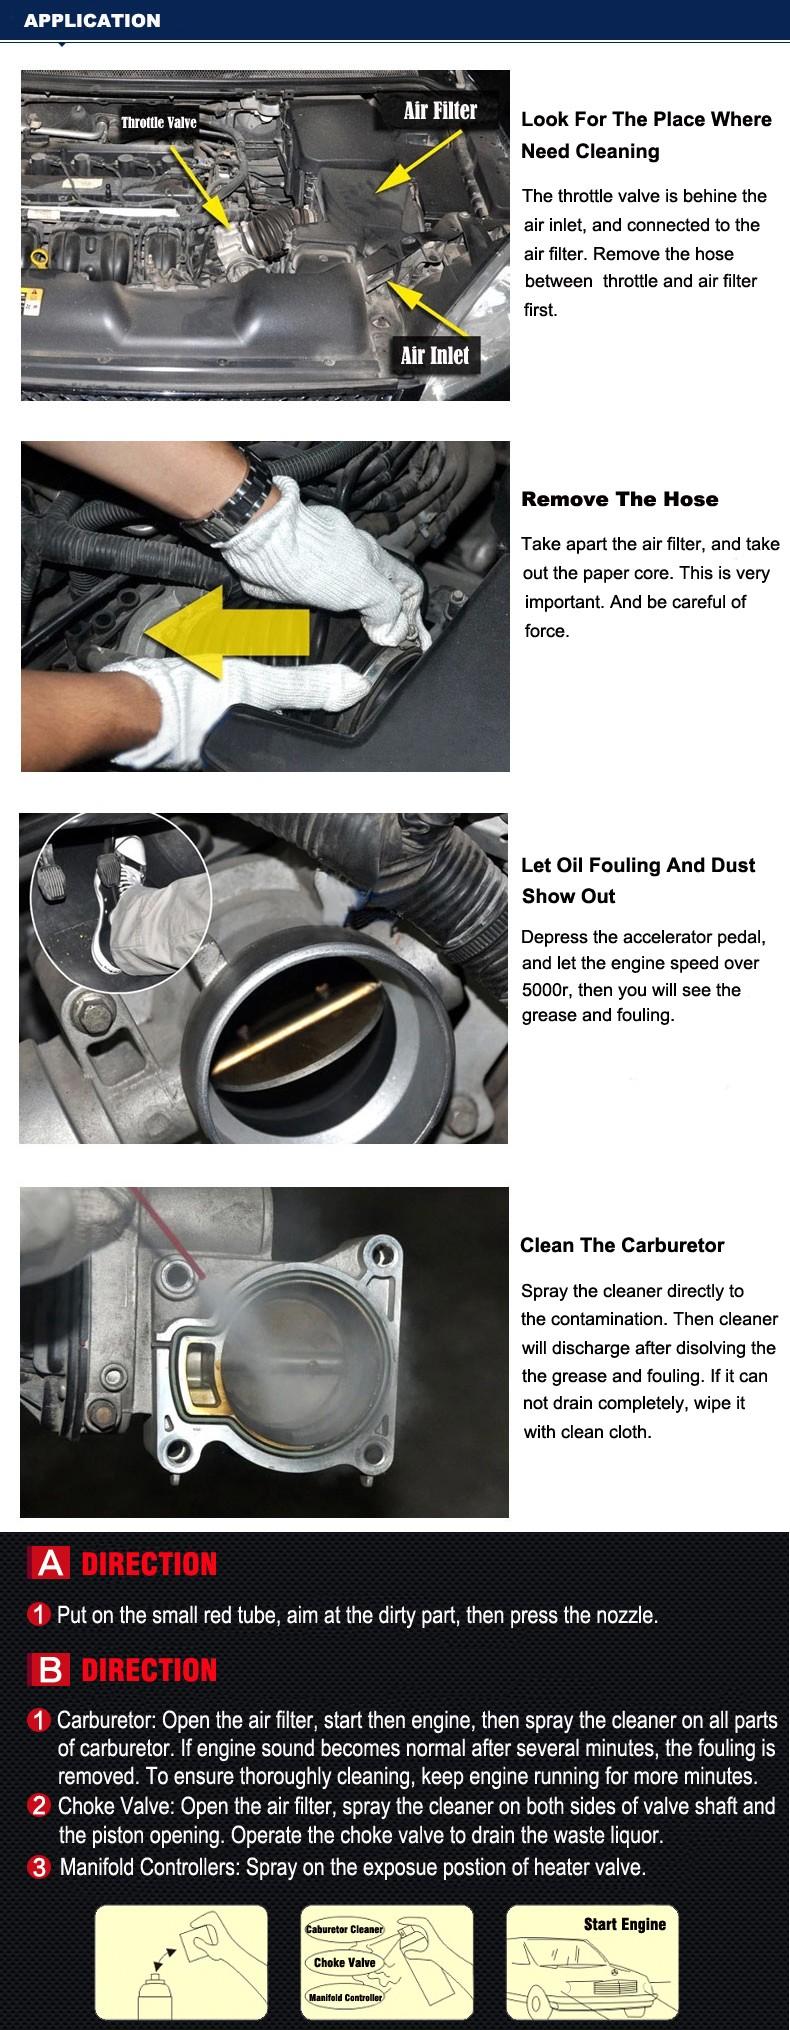 Carb Spray Cleaner 8.jpg